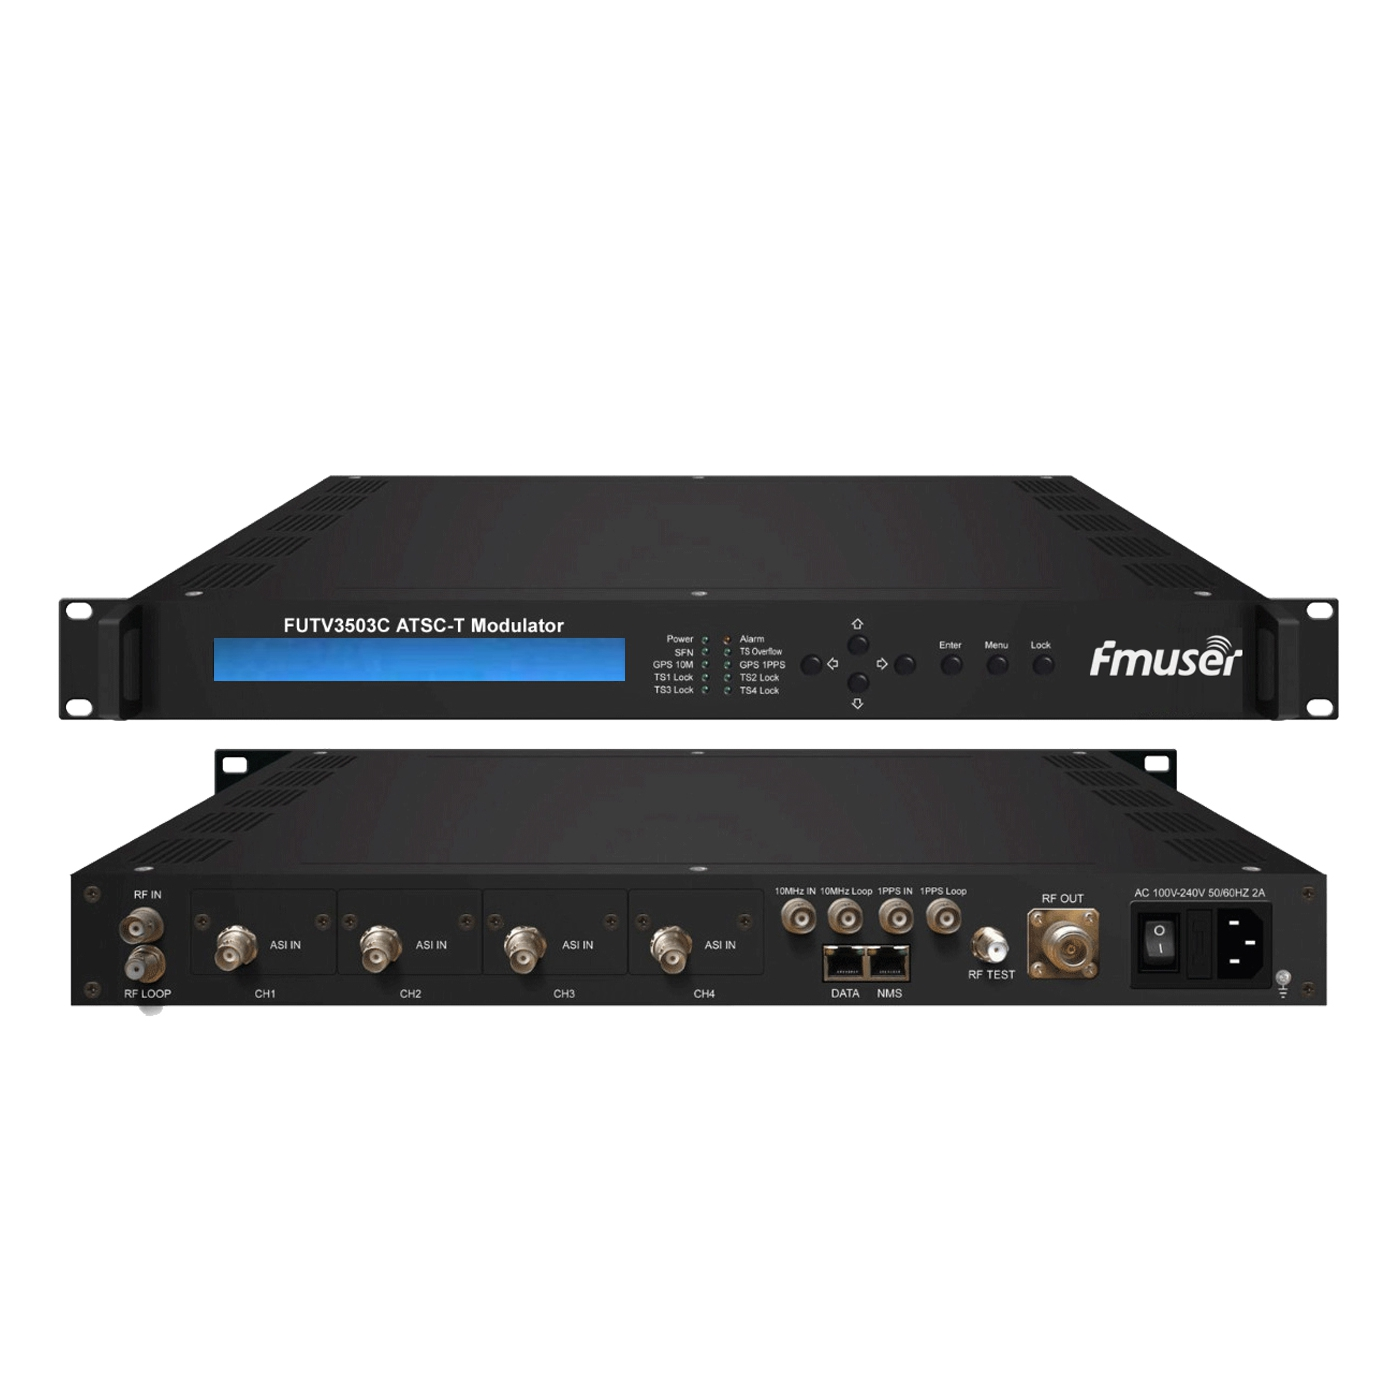 FMUSER FUTV3503C ATSC-T 8VSB modulator 8-VSB go RF modhnú (2 * ionchur 2M ASI / 310 * SMPTE, ontput RF, ATSC 8VSB modhnú) leis an mbainistíocht Líonra